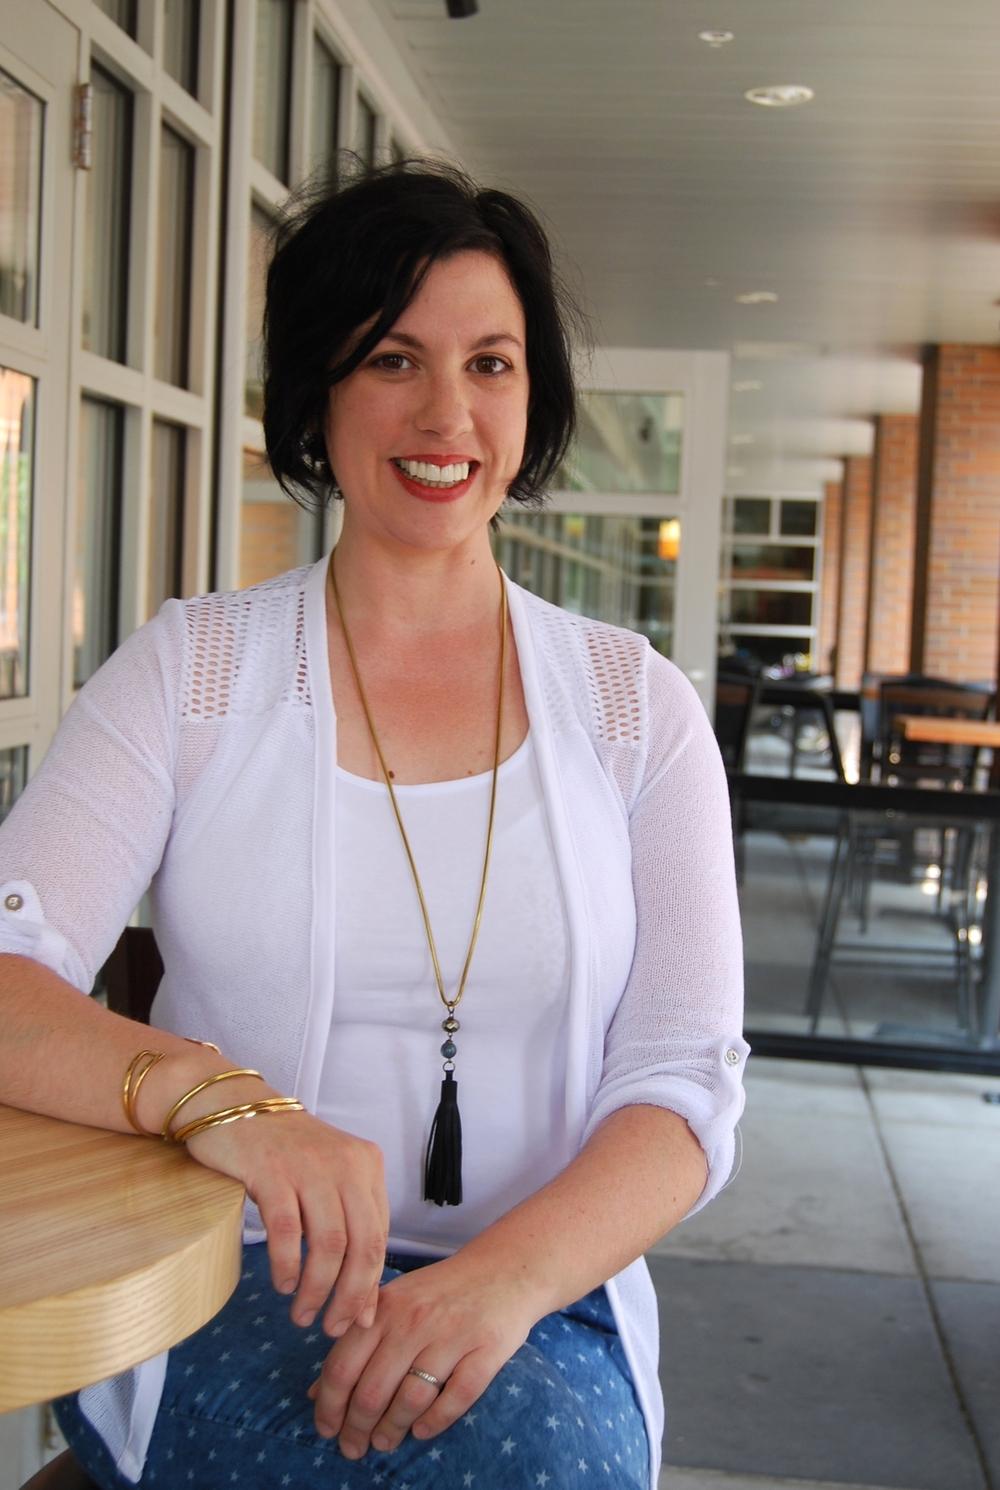 Jen wearing Kisa mesh cardigan in white, racer back tank, star denim capris with Litany leather tassel necklace